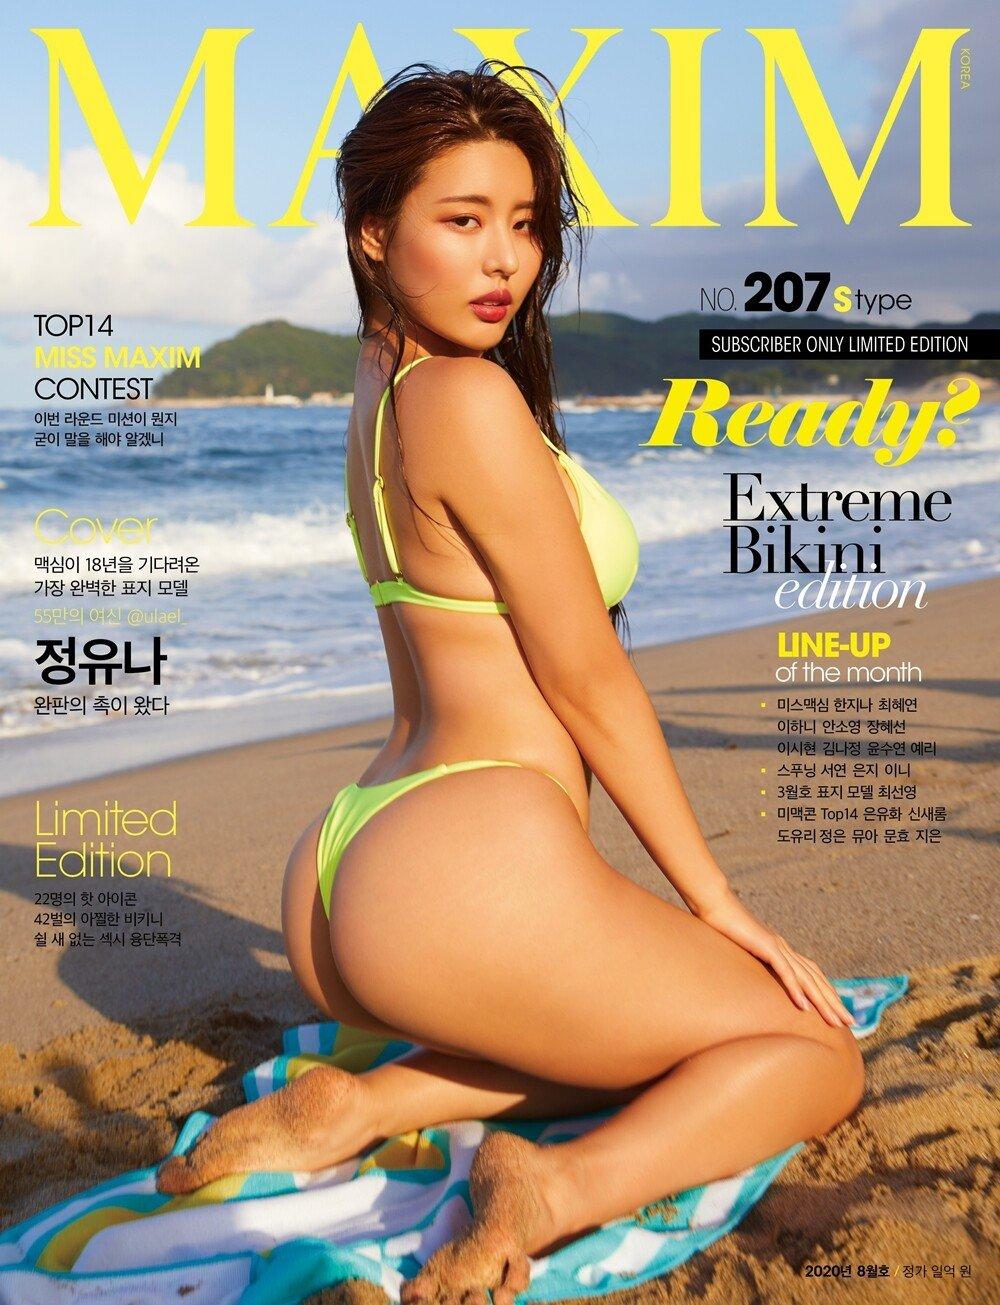 image_readtop_2020_768084_15958437984295413.jpg ㅇㅎ) 한국 女카레이서 몸매 피지컬